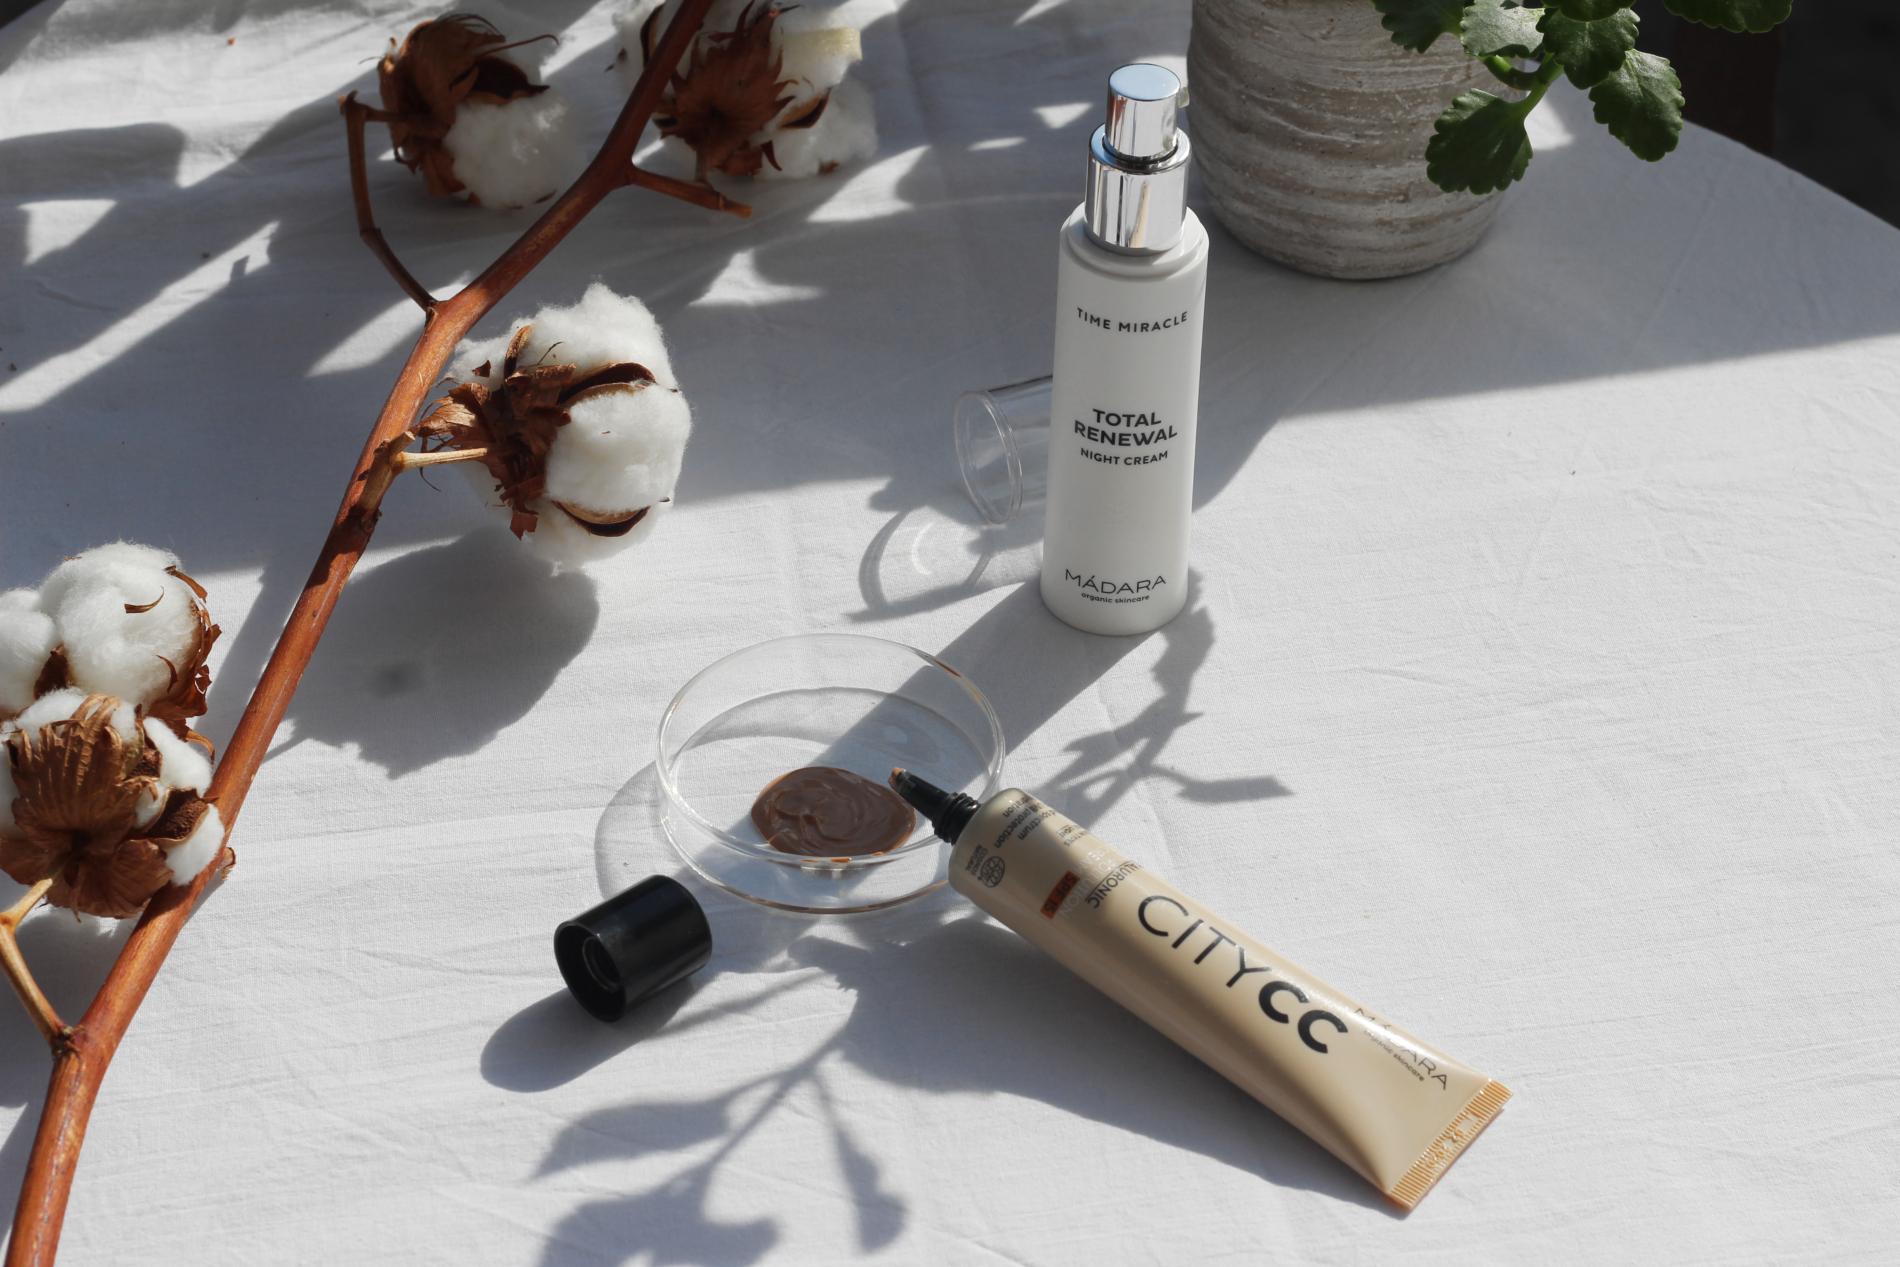 annaporter-madara-cosmetics-review.jpg